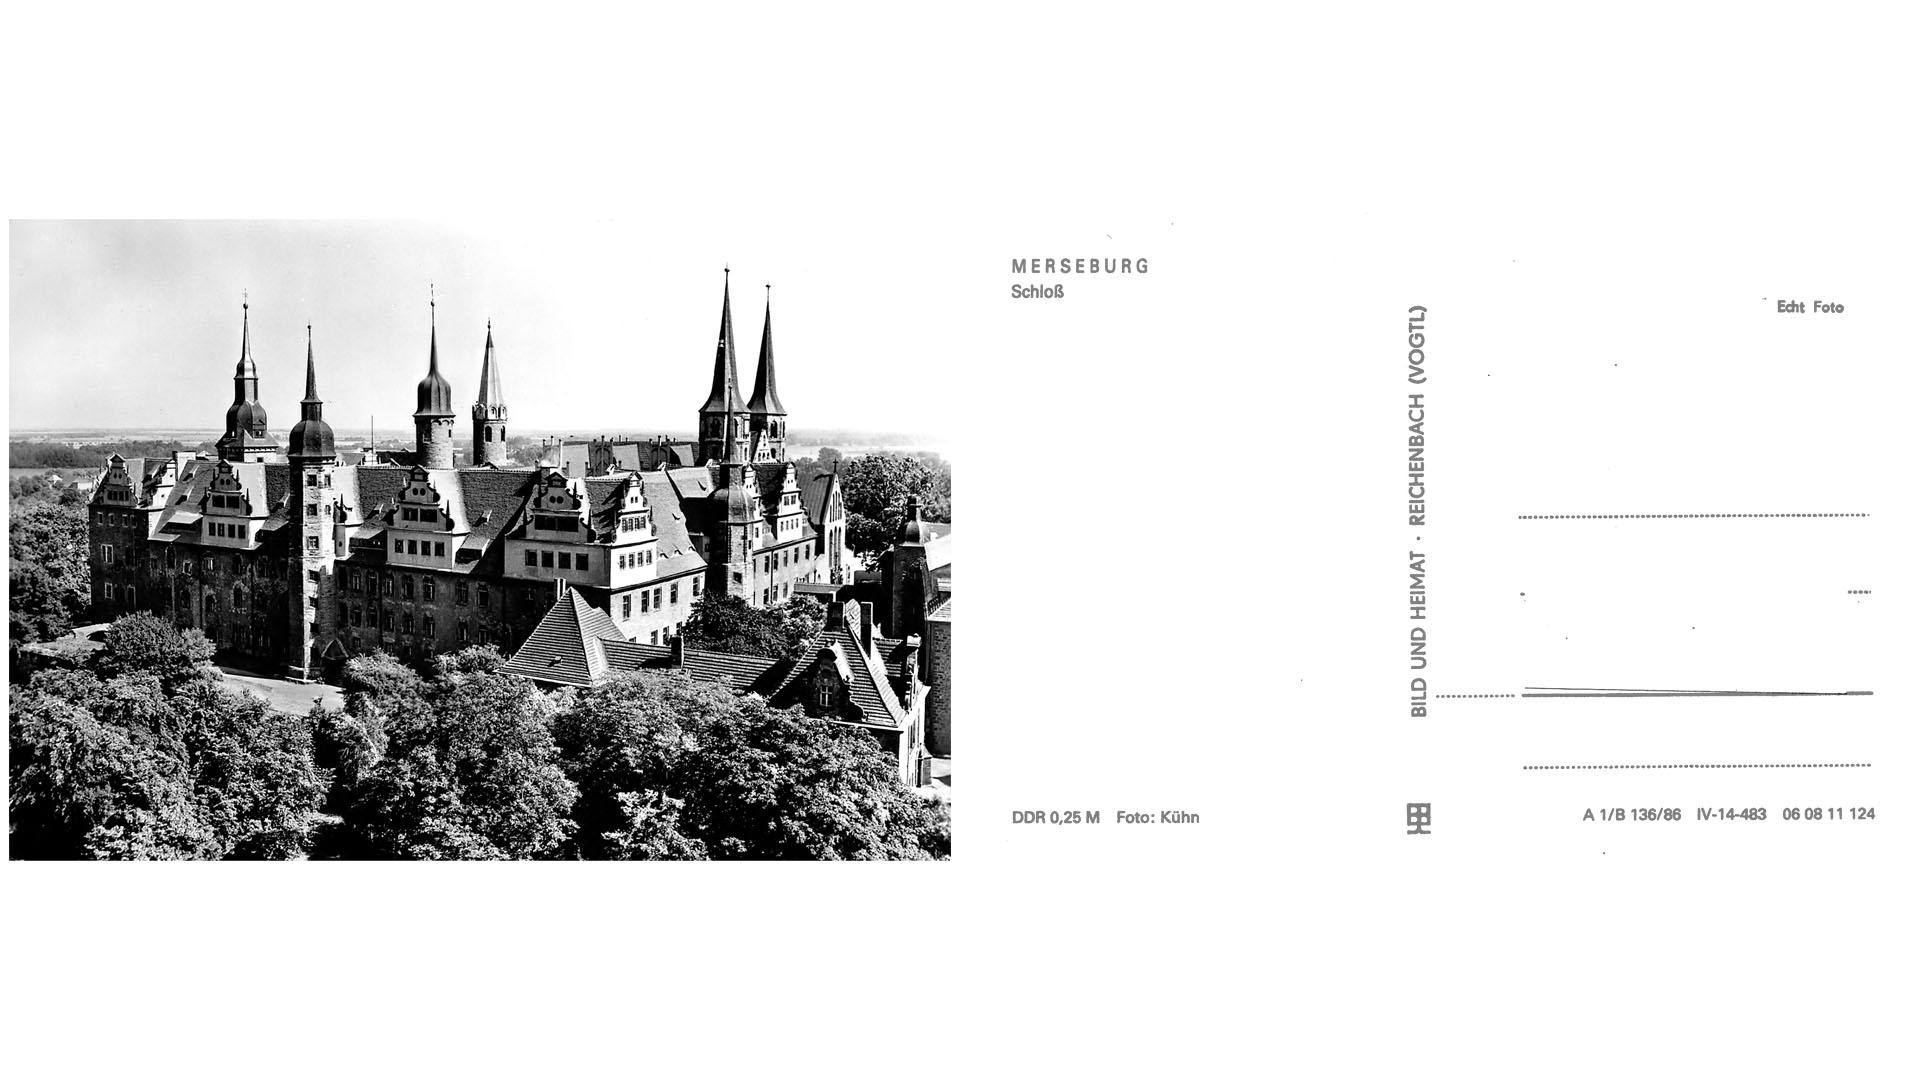 Merseburg - Schloß